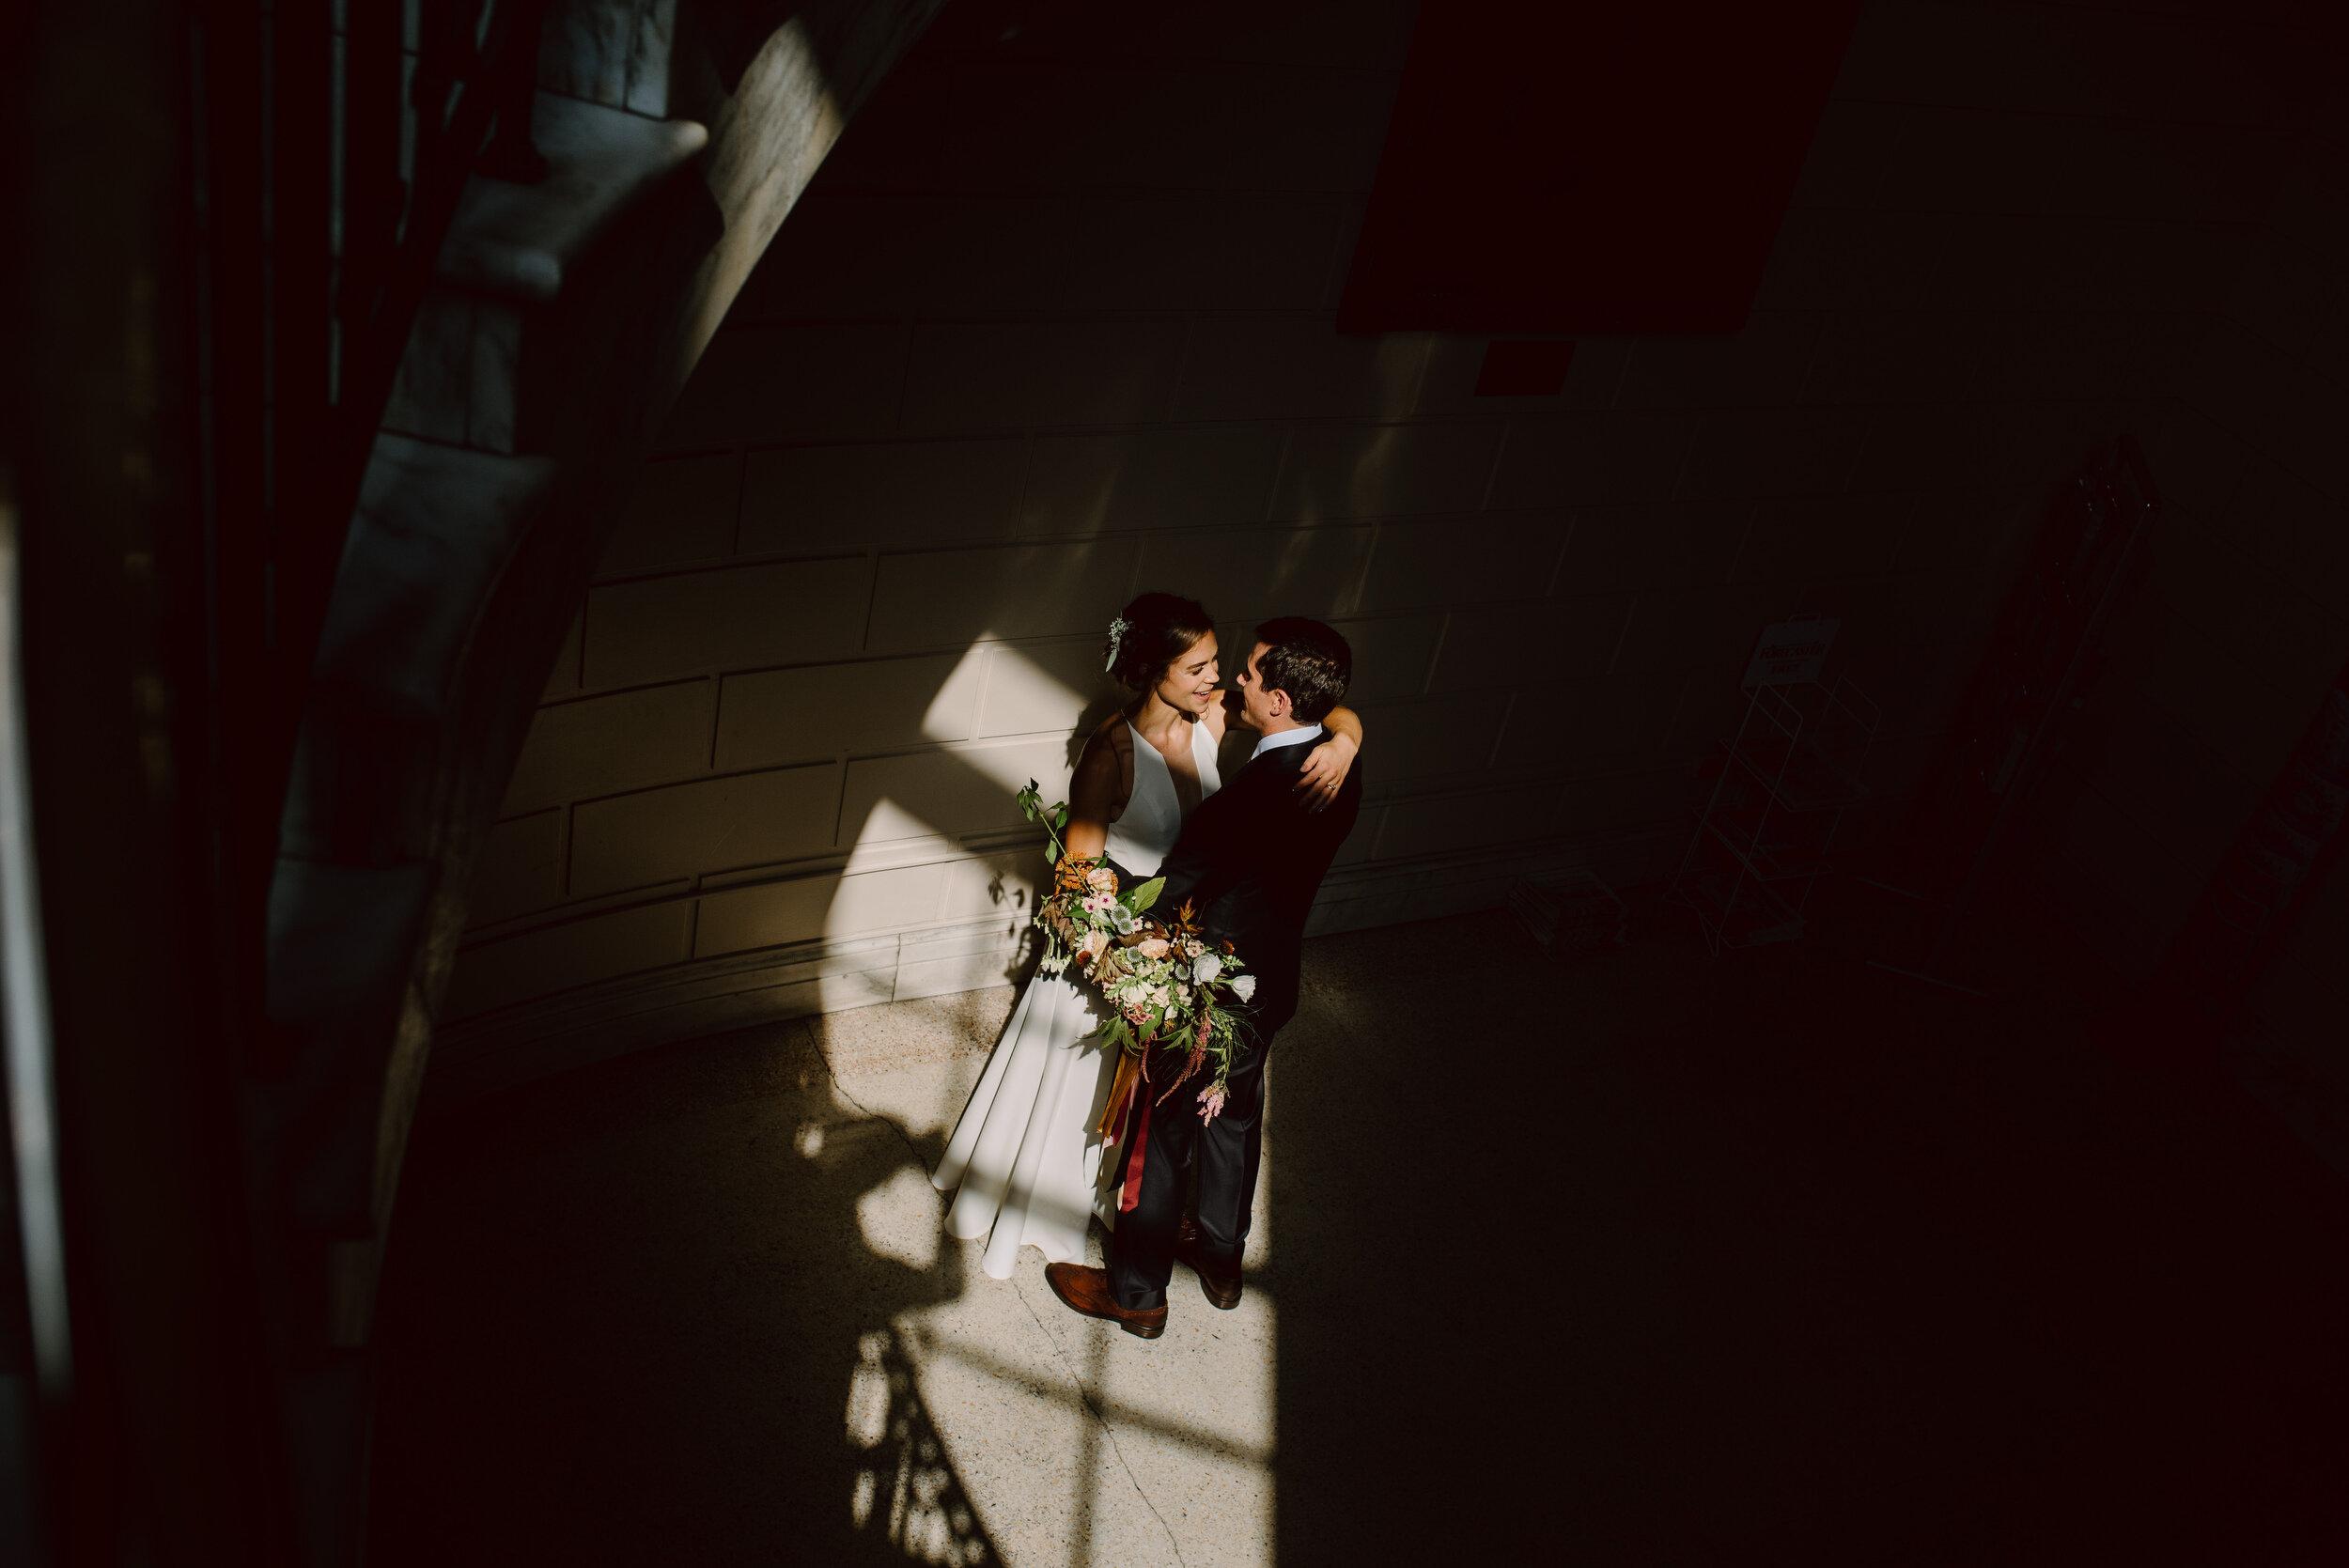 portland_city_hall_wedding_mikhail_glabet_28.JPG